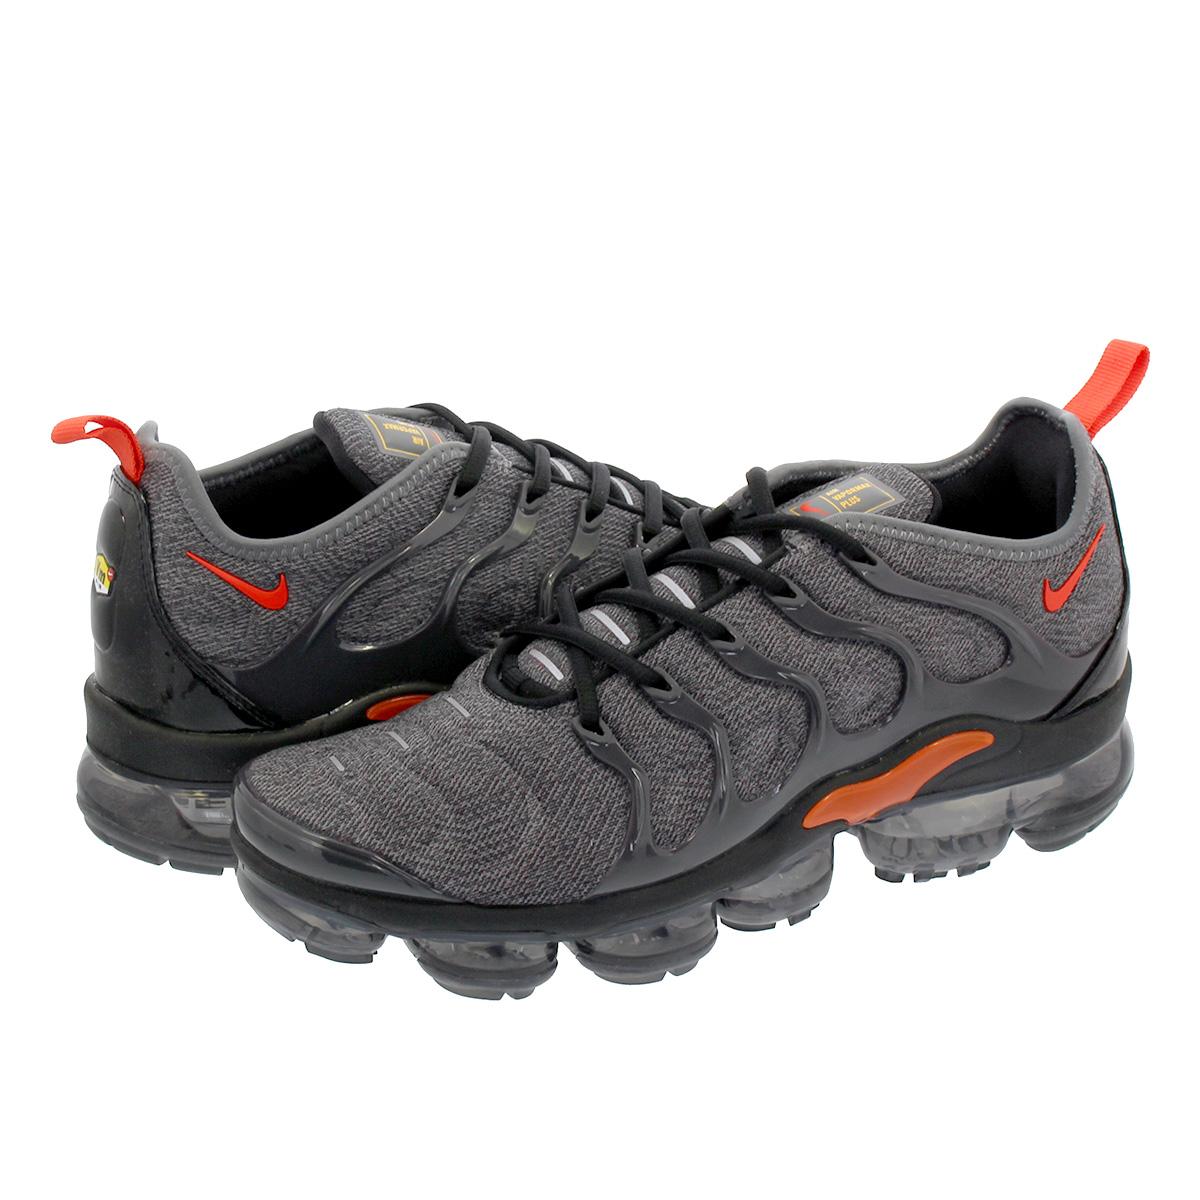 online store ebfbd e021f NIKE AIR VAPORMAX PLUS Nike vapor max plus GREY/TEAM ORANGE 924,453-012